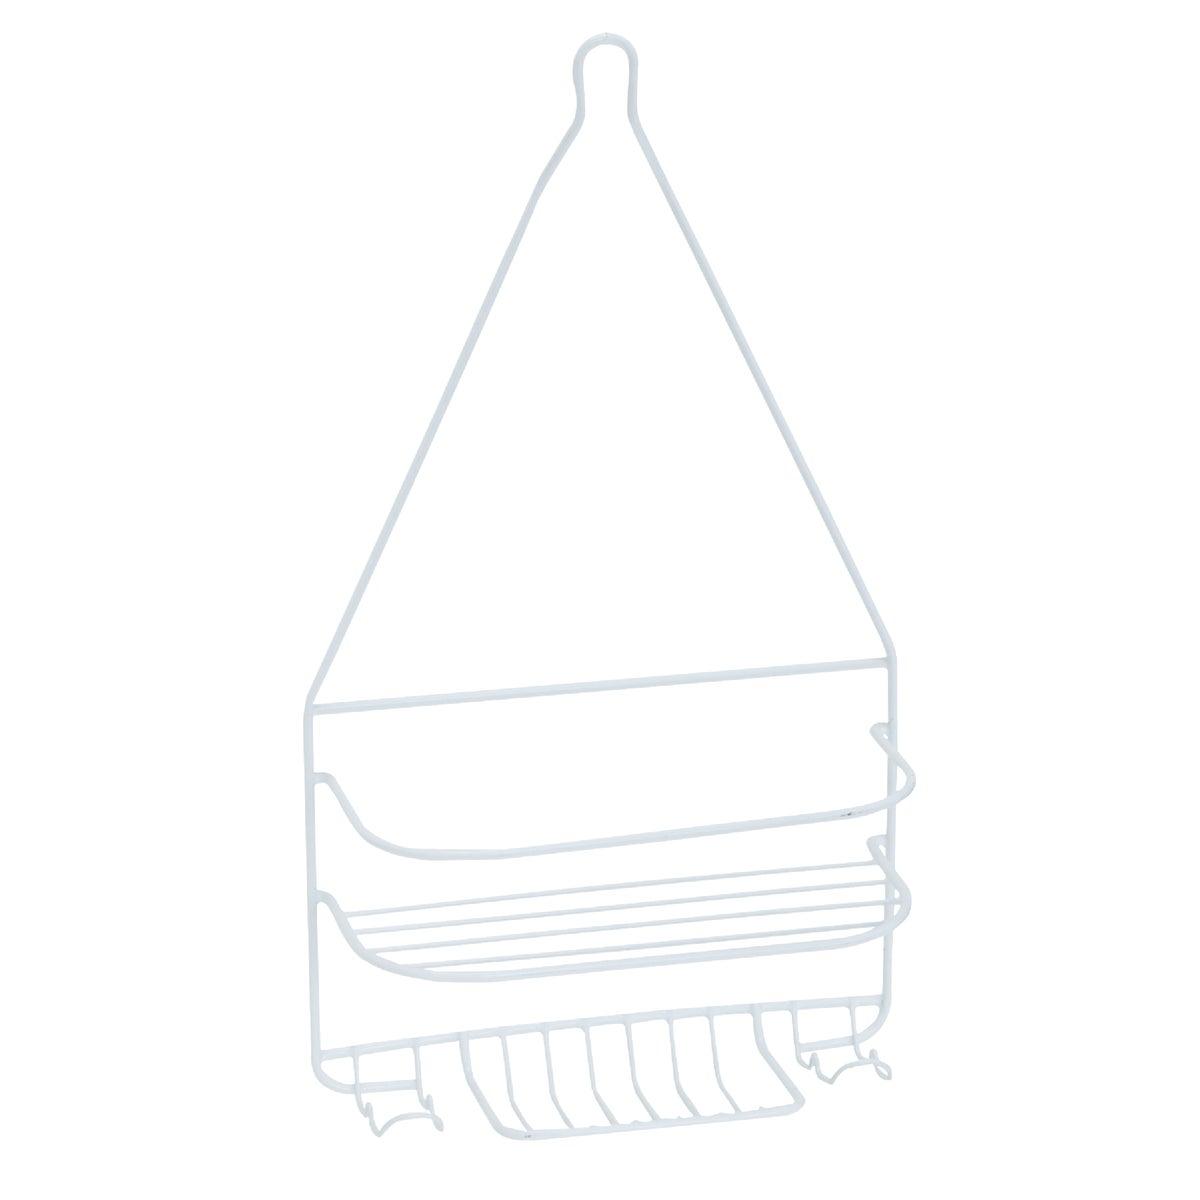 Holmz-Selfix LARGE SHOWER ORGANIZER 21530301.36